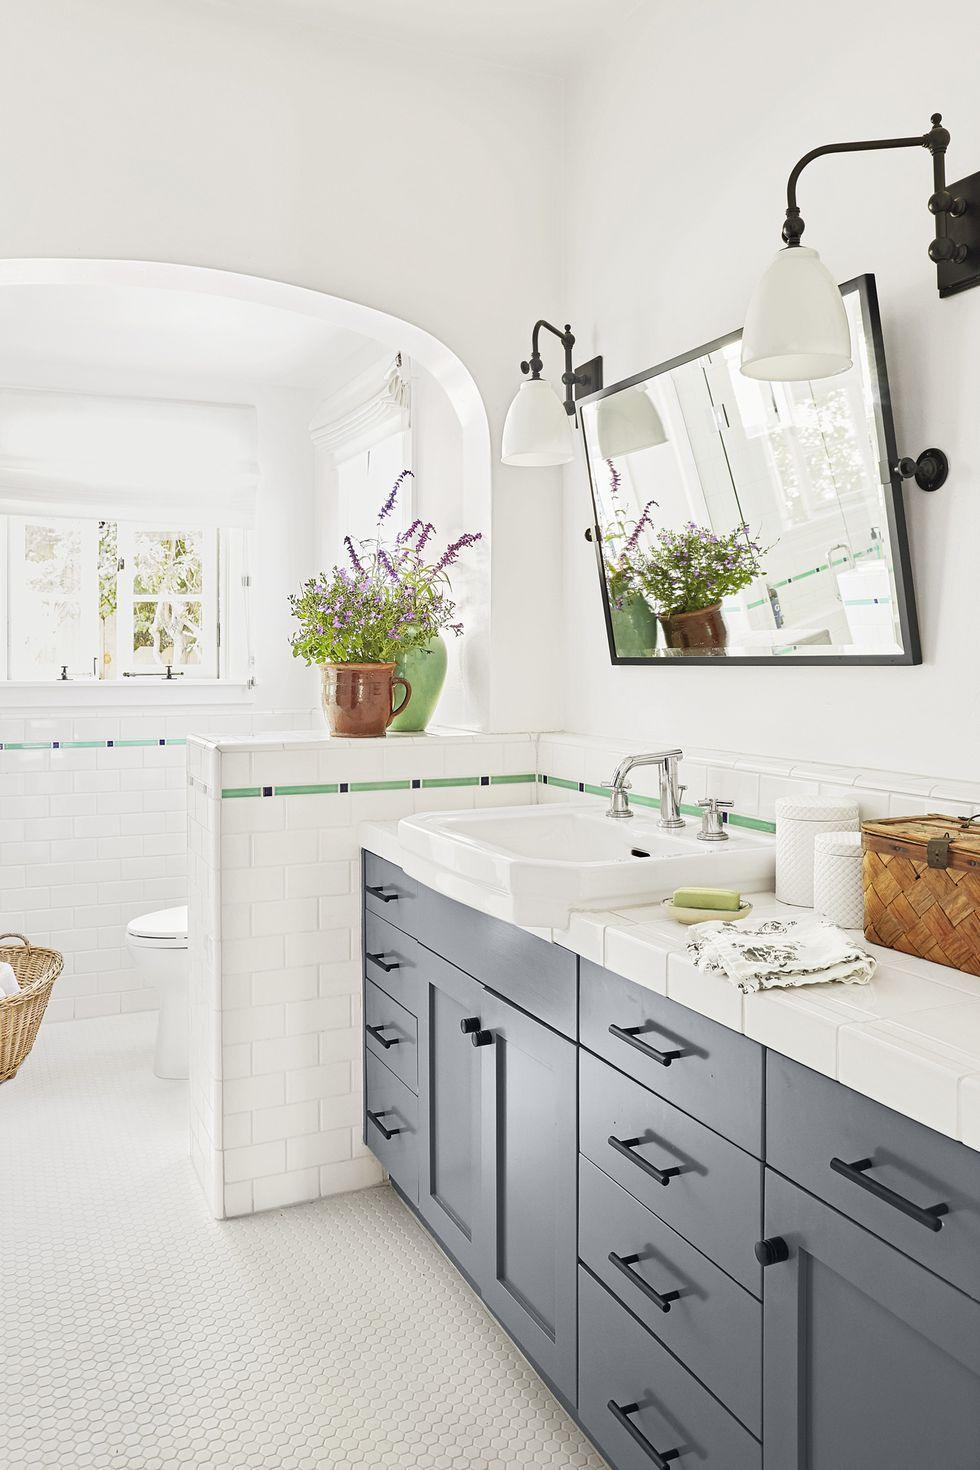 100 Best Bathroom Decorating Ideas - Decor & Design Inspirations for